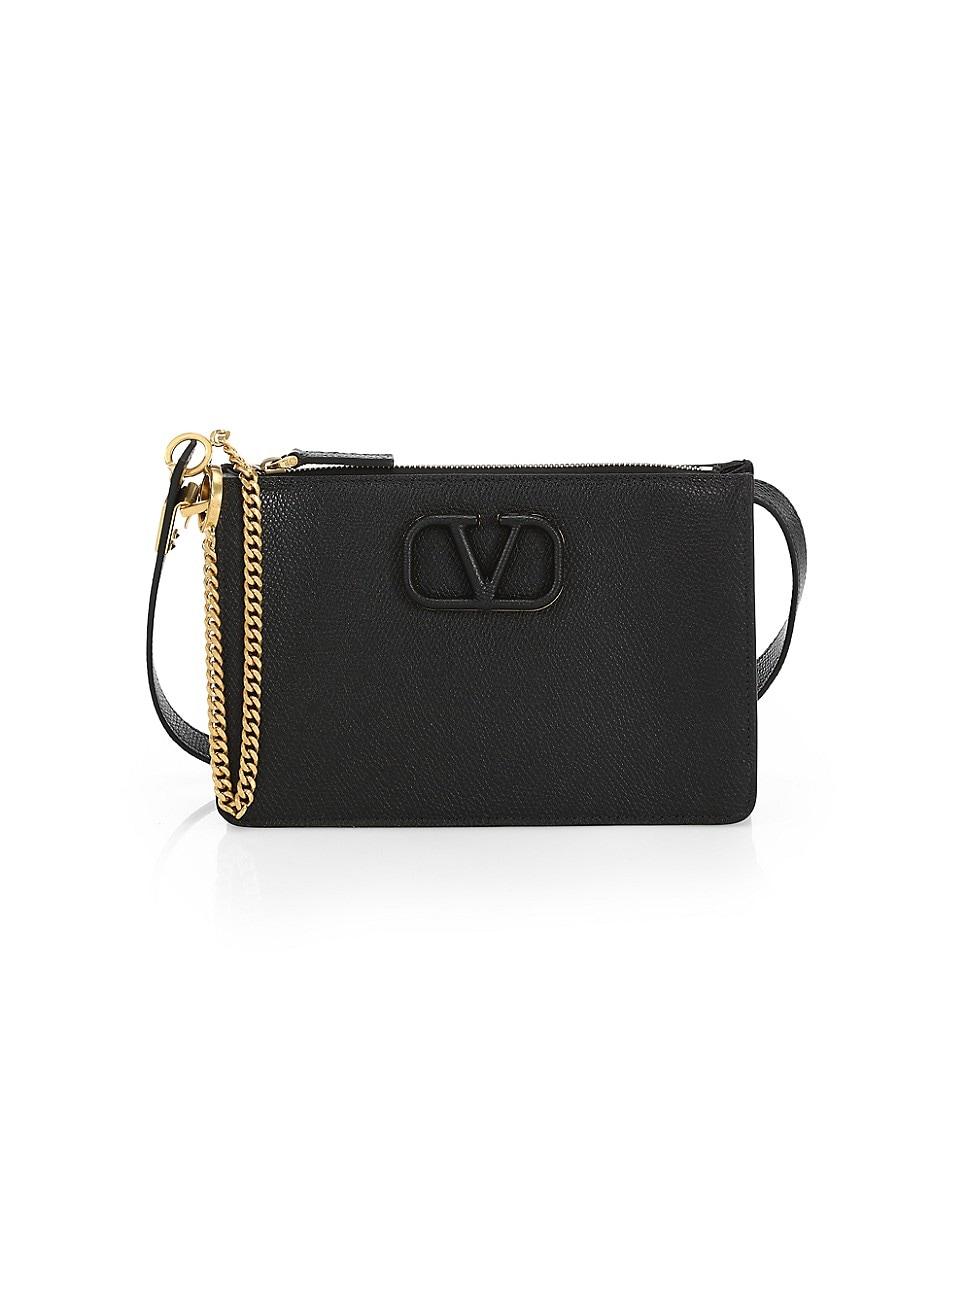 Valentino Garavani Garavani Vsling Leather Crossbody Pouch In Black